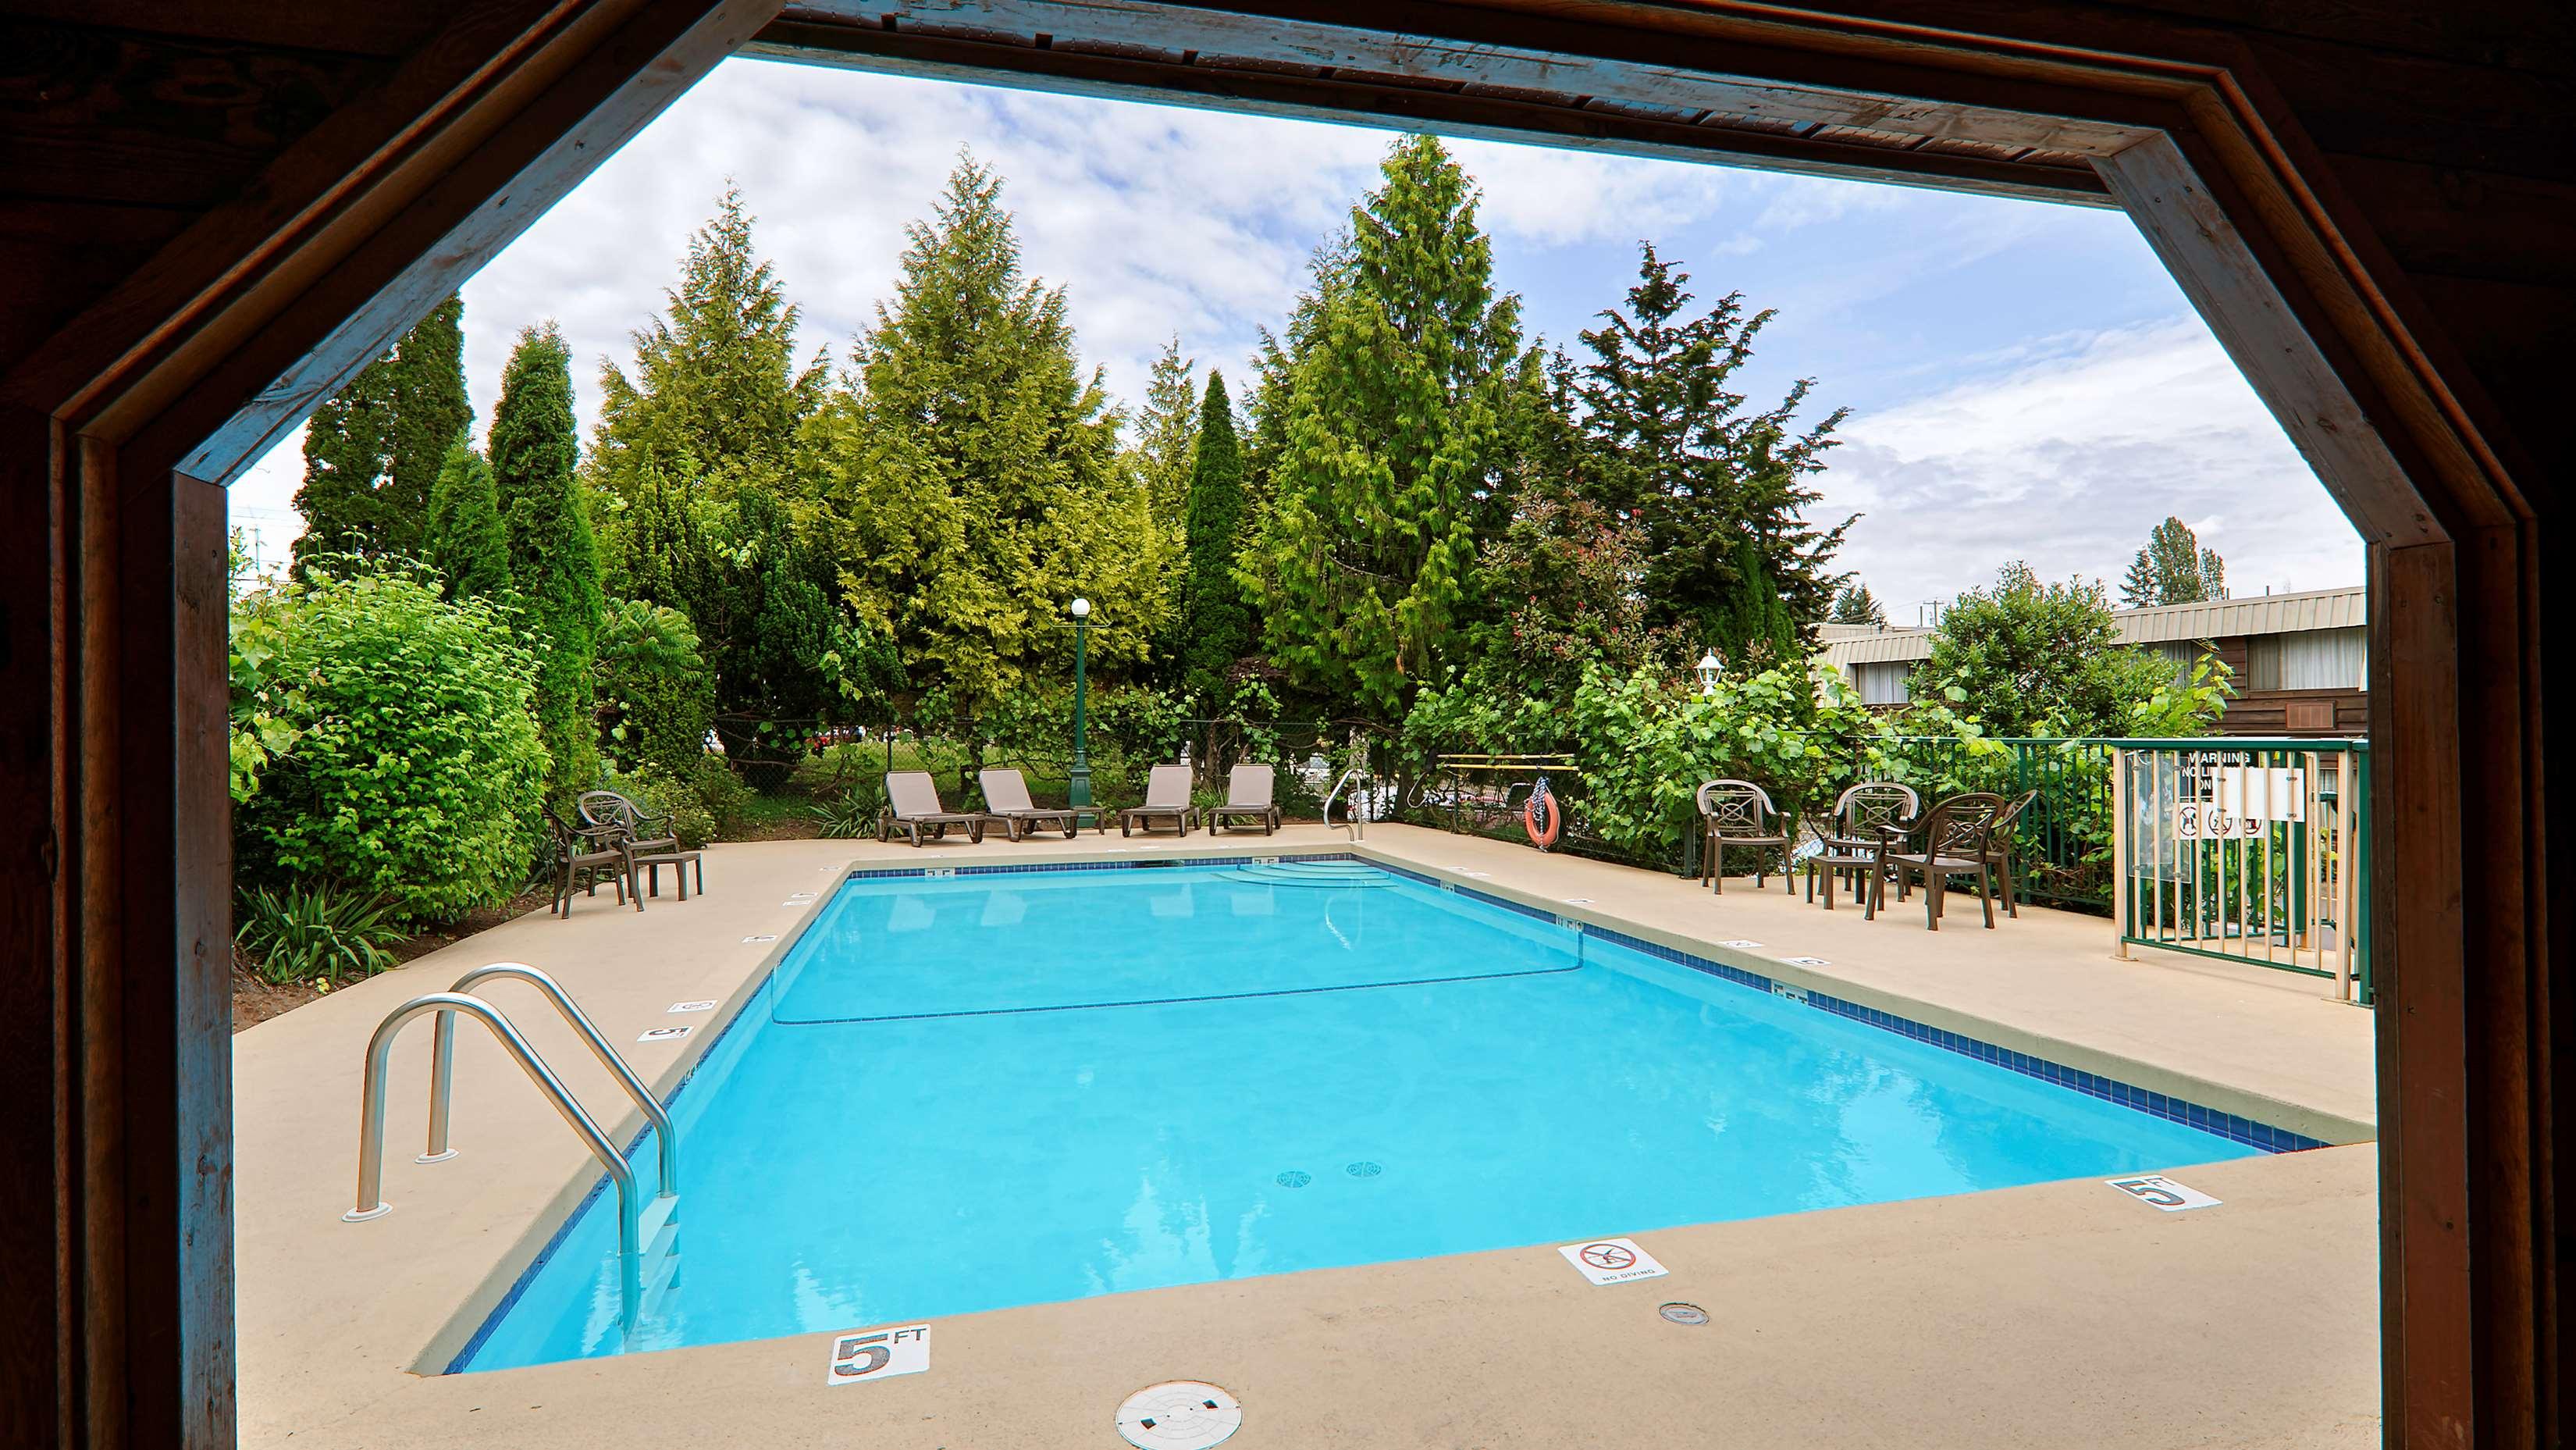 Best Western Cowichan Valley Inn in Duncan: Outdoor Pool